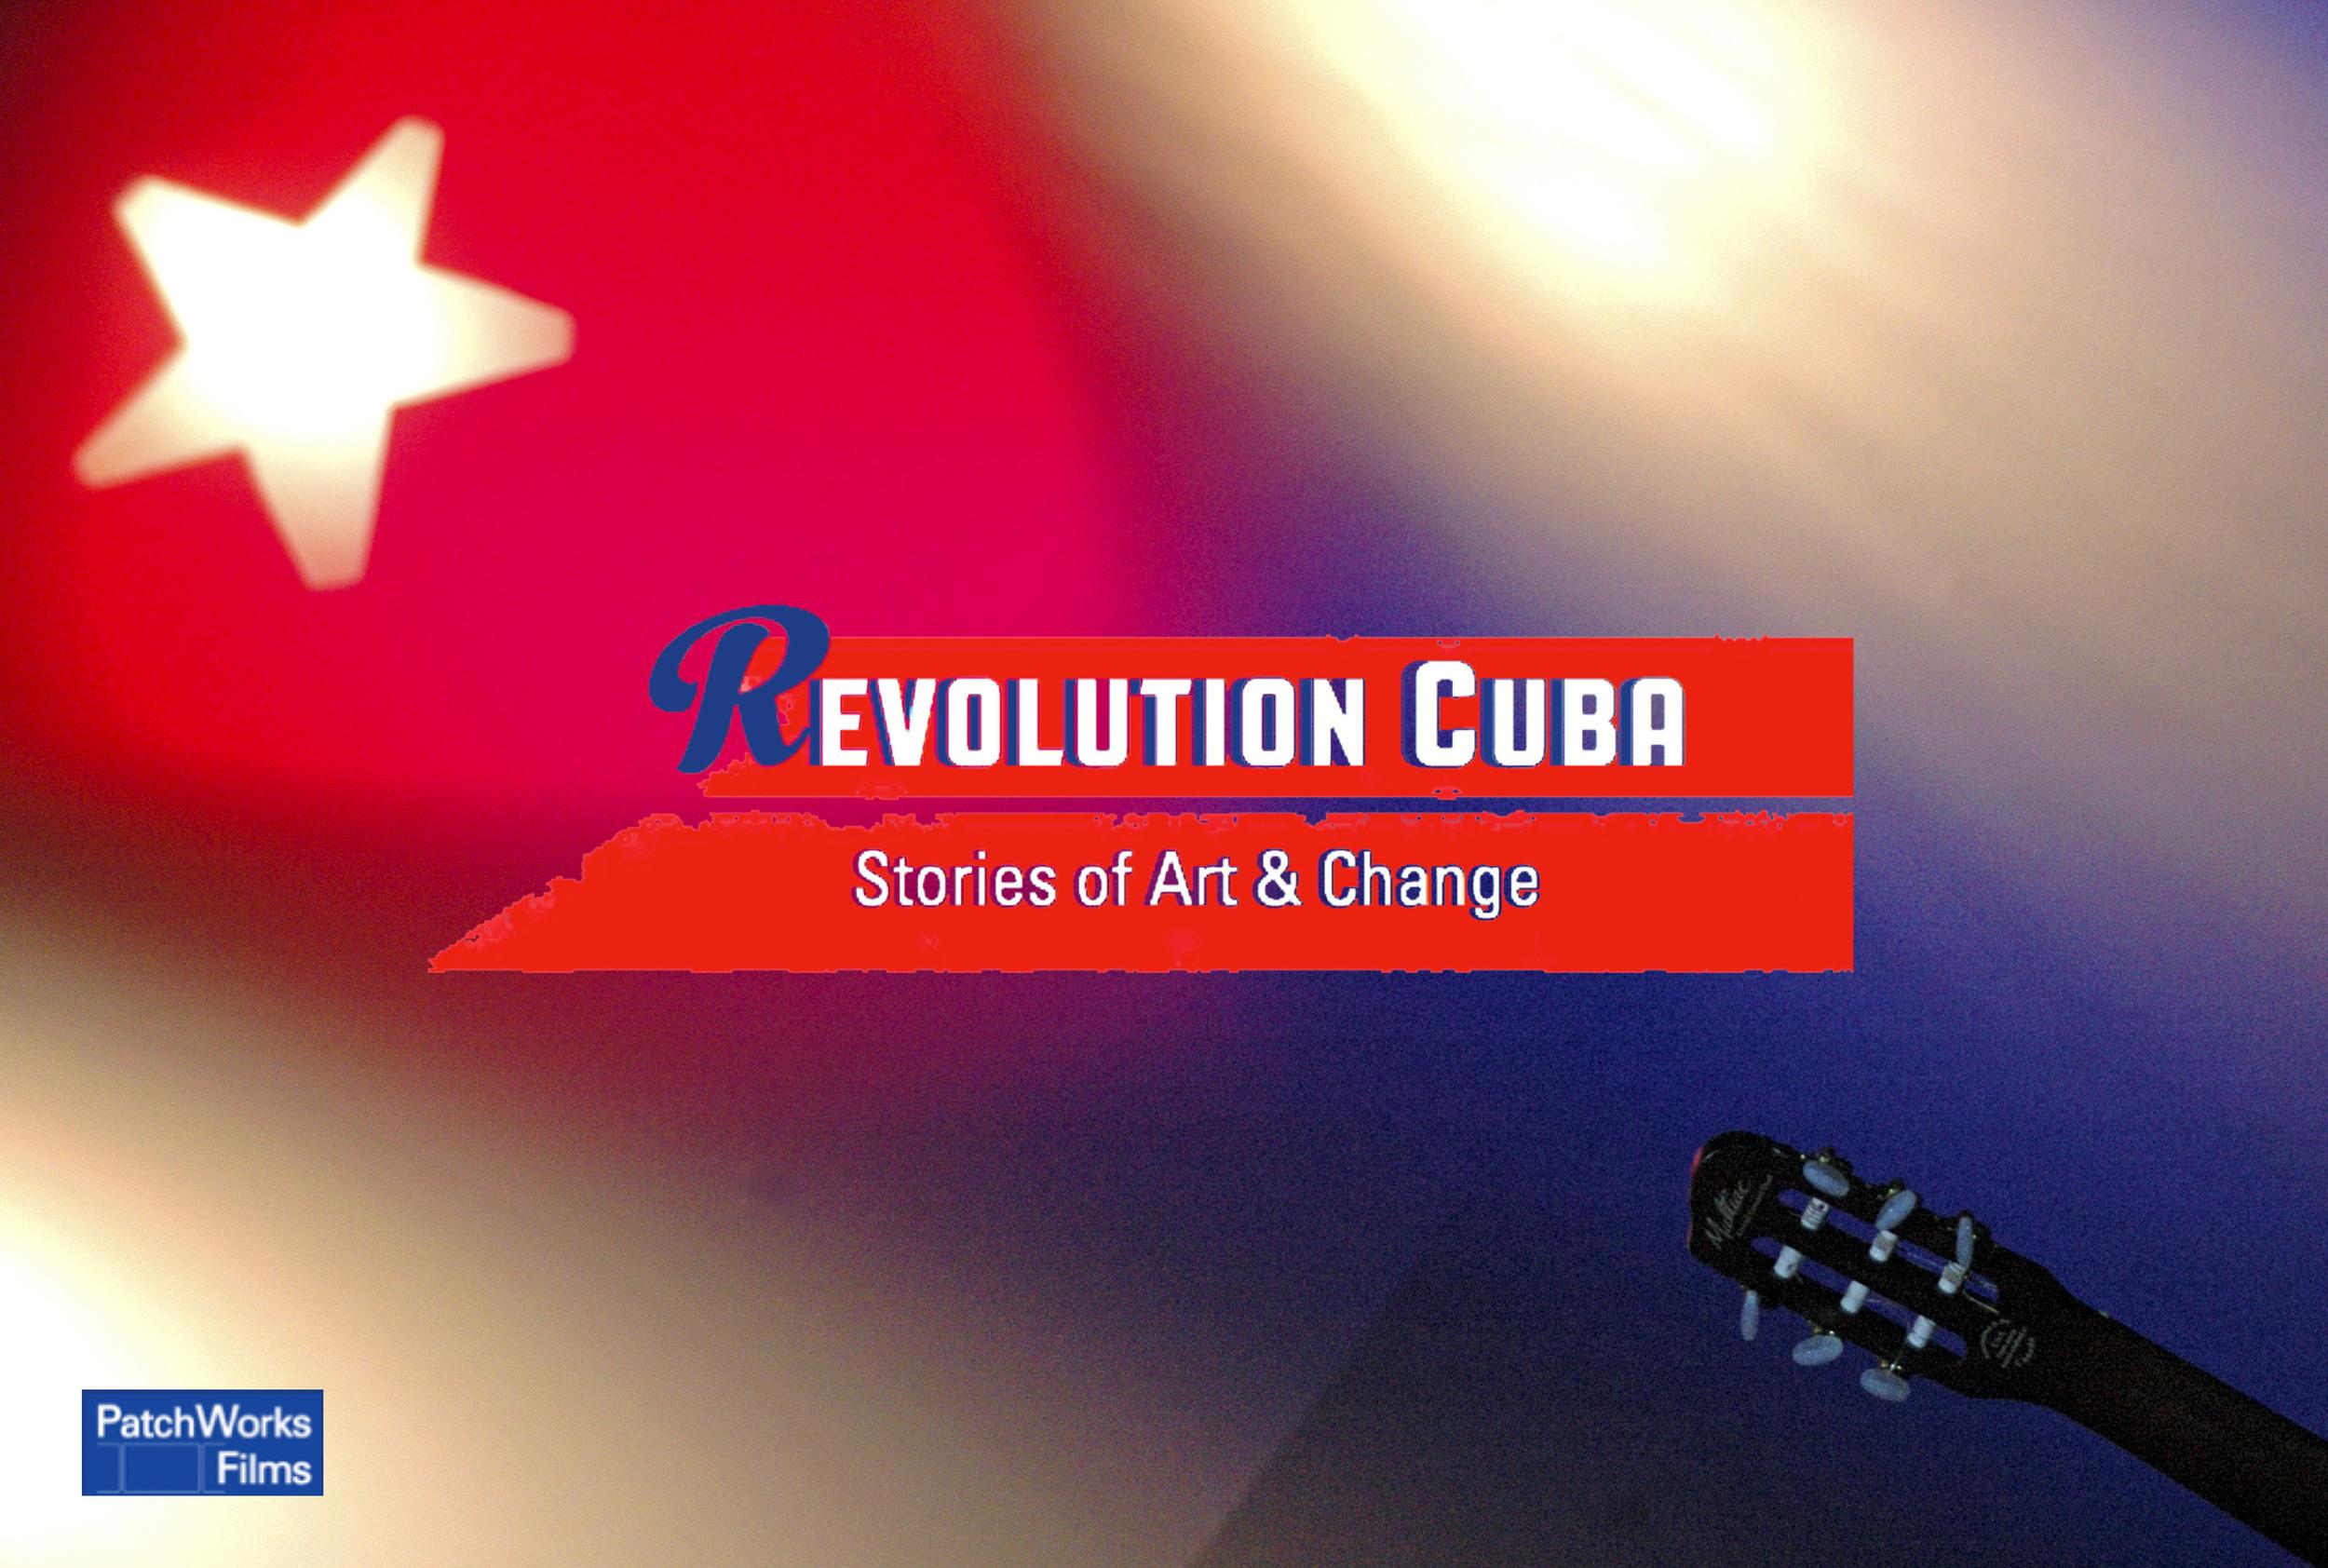 Rev Cuba logo.jpg